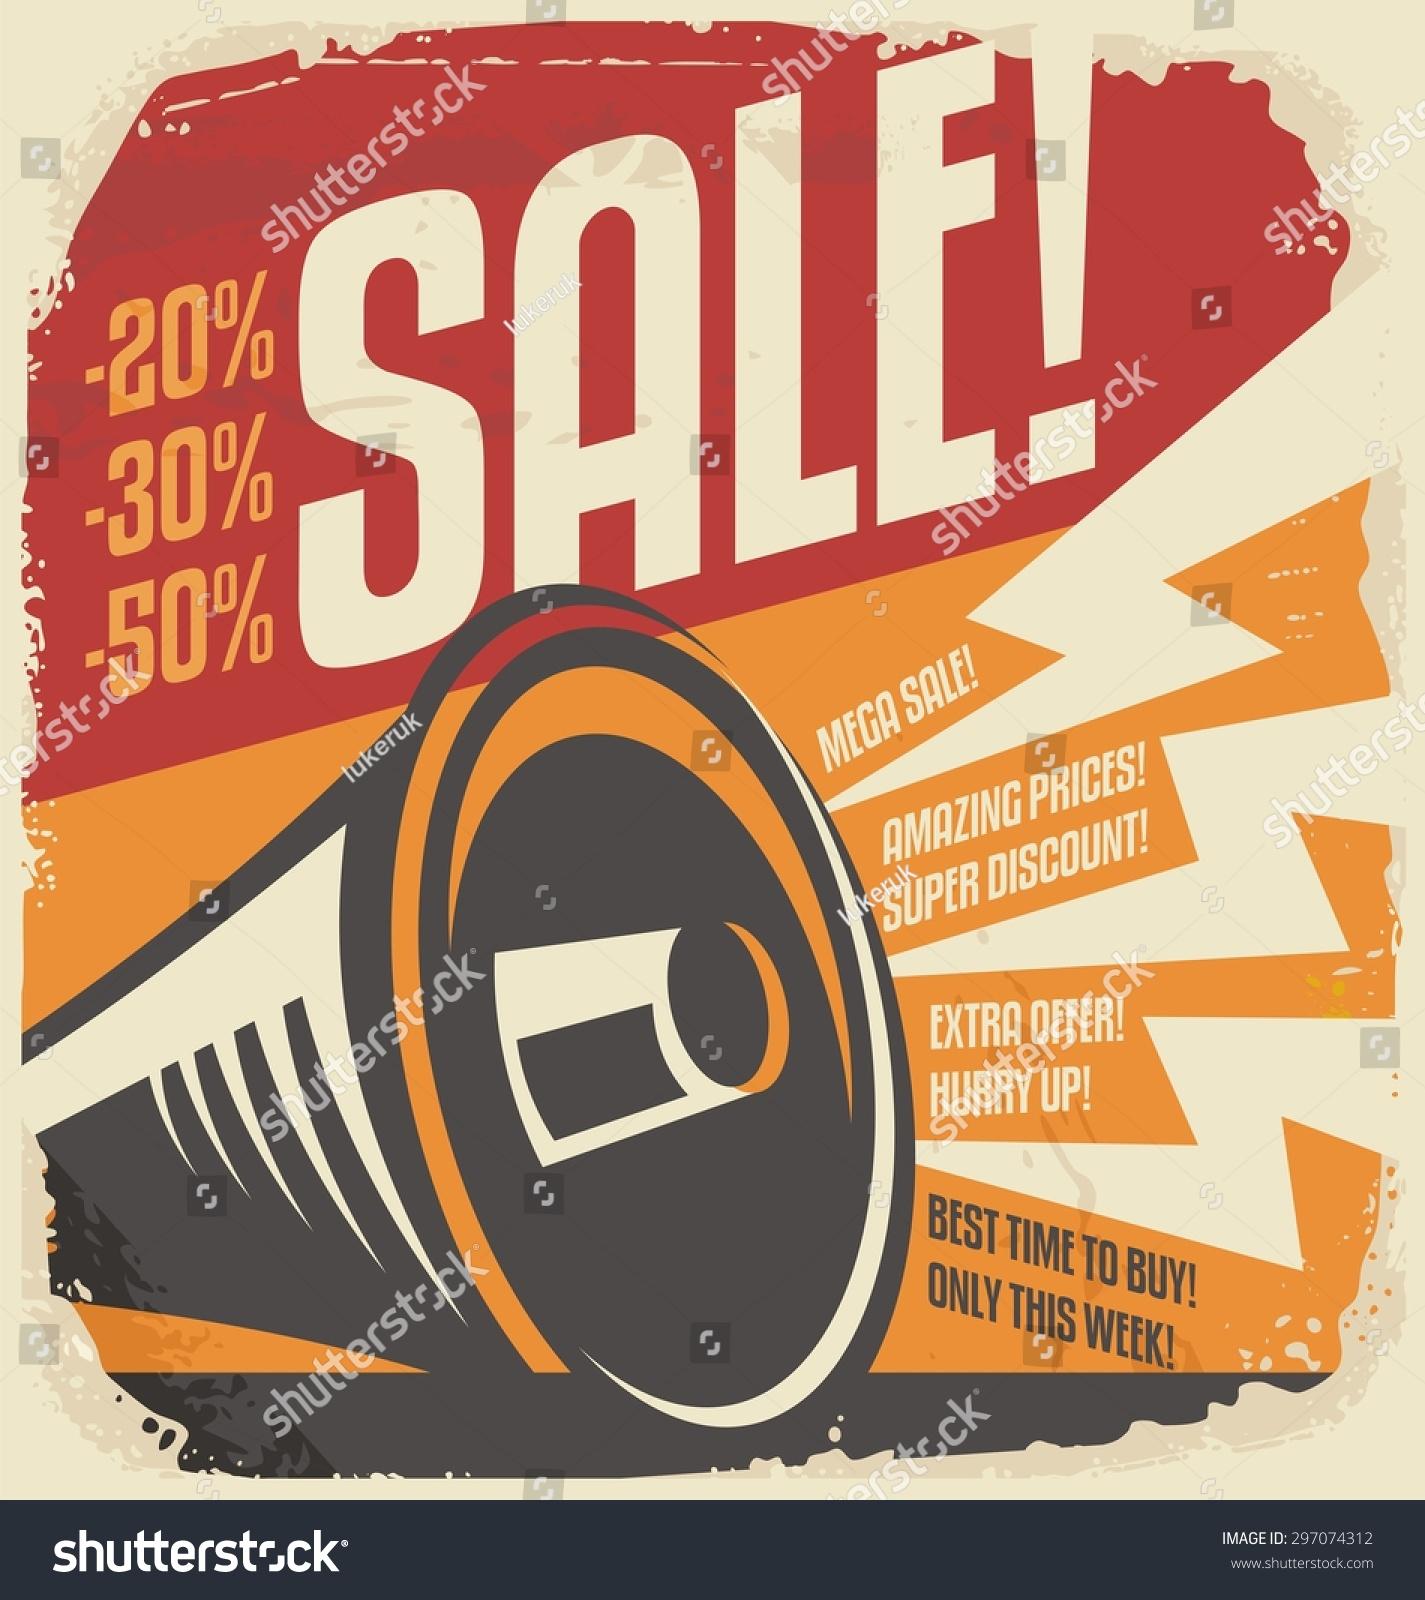 Retro Sale Poster Design Concept. Vintage Vector Ad With